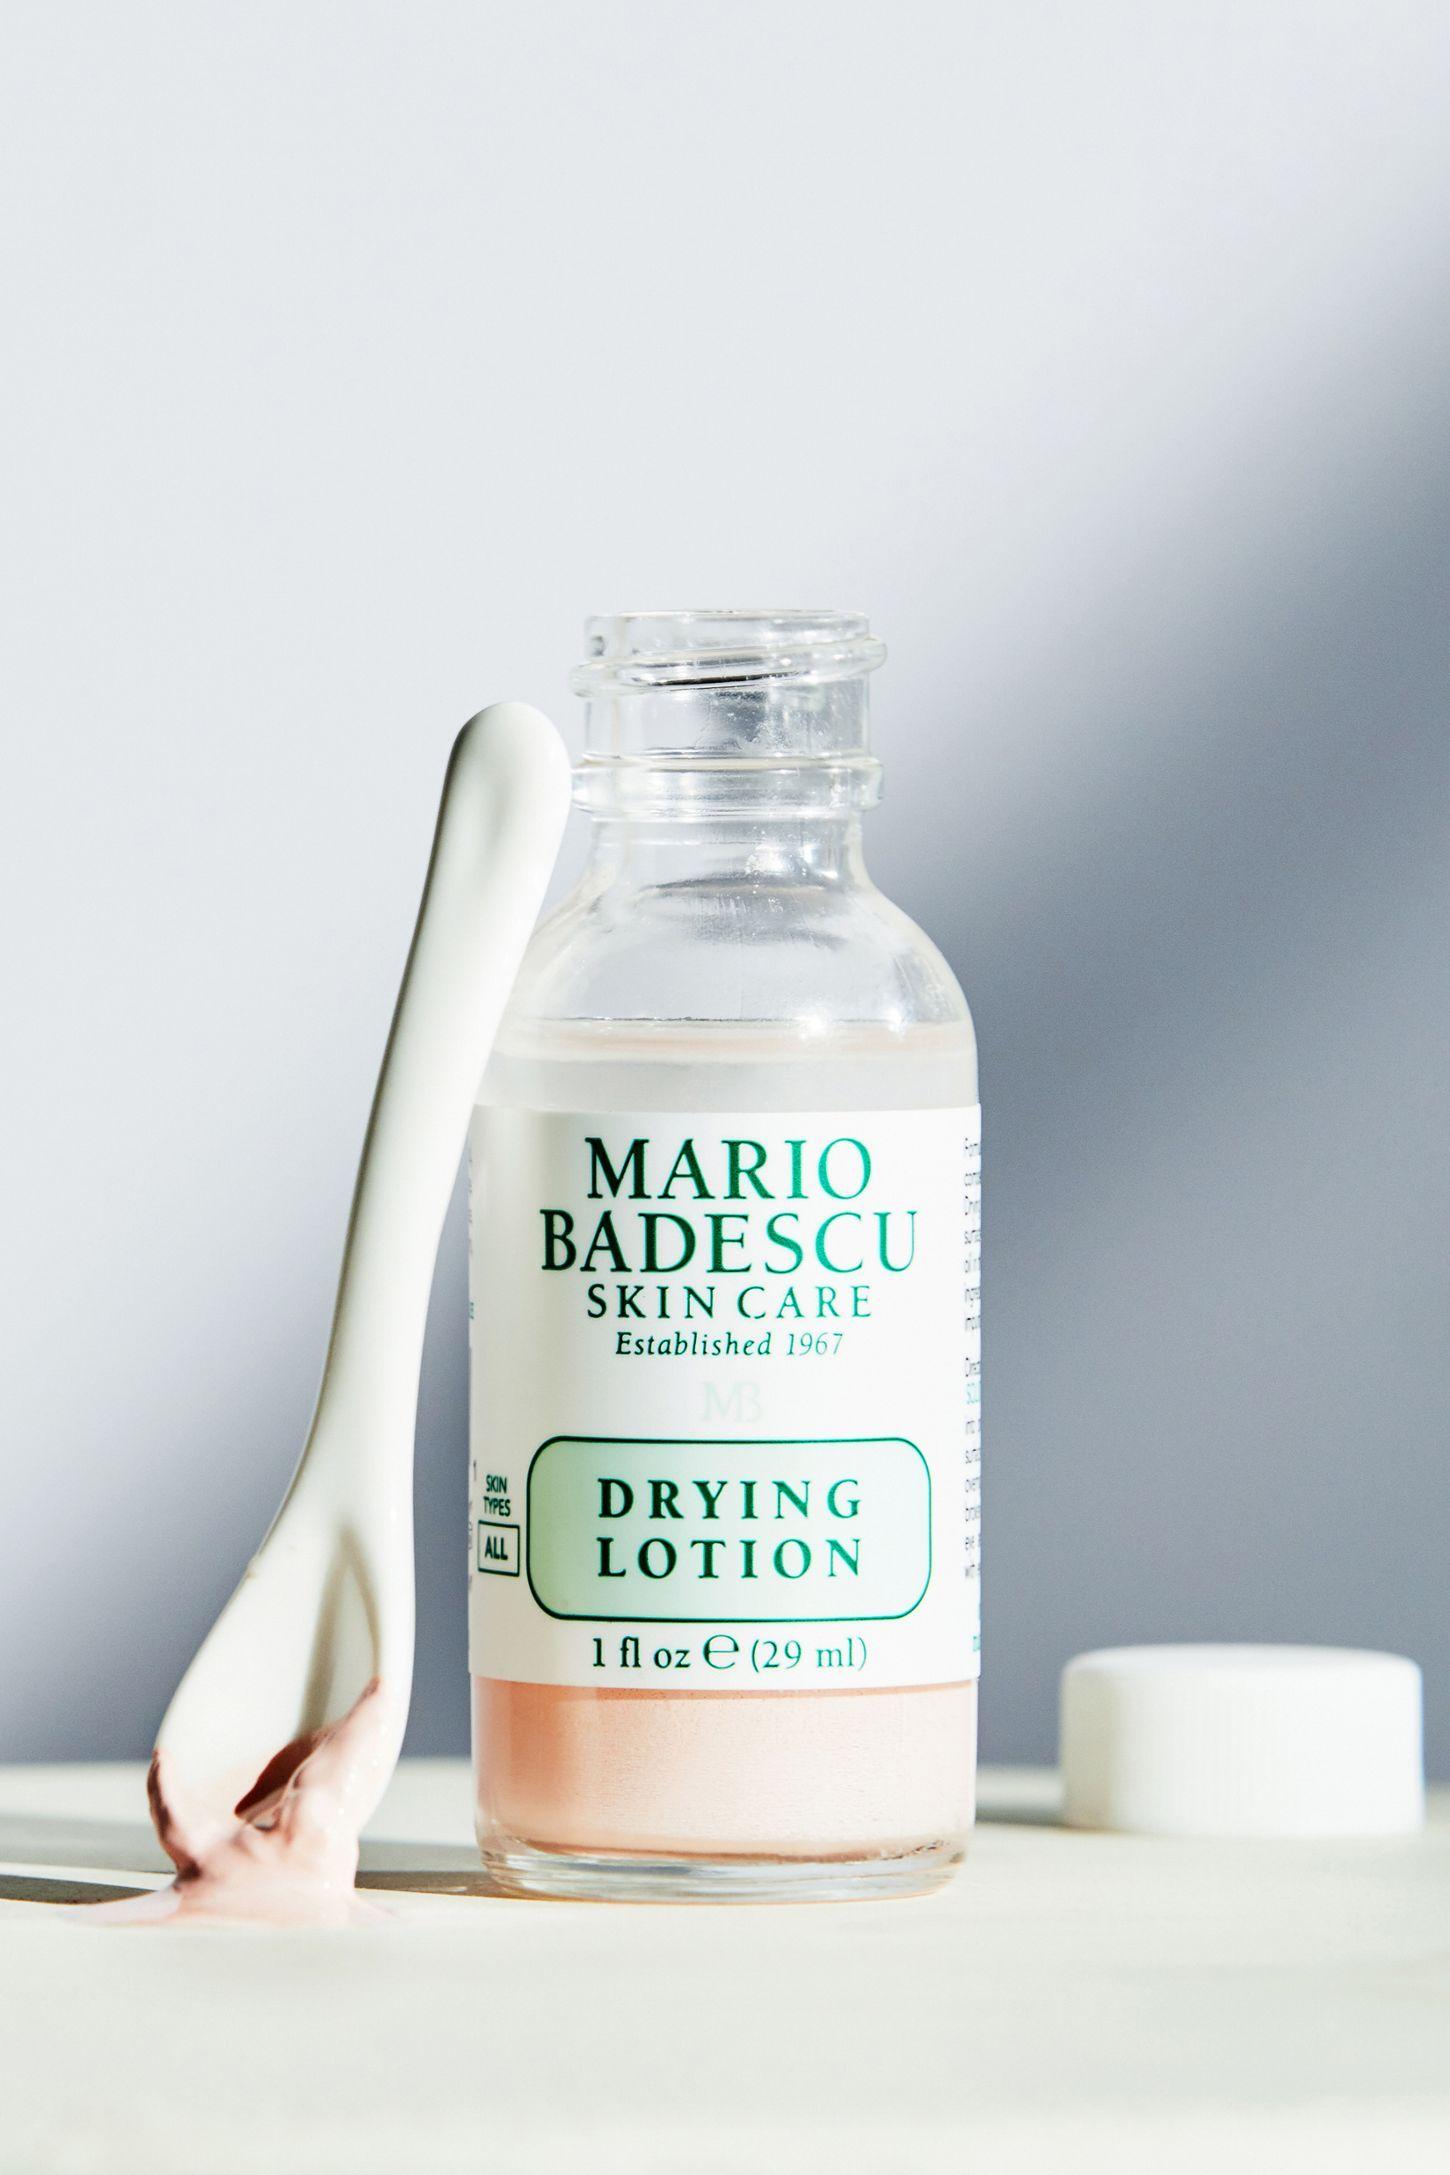 Mario Badescu Drying Lotion Body Shop Tea Tree Spot